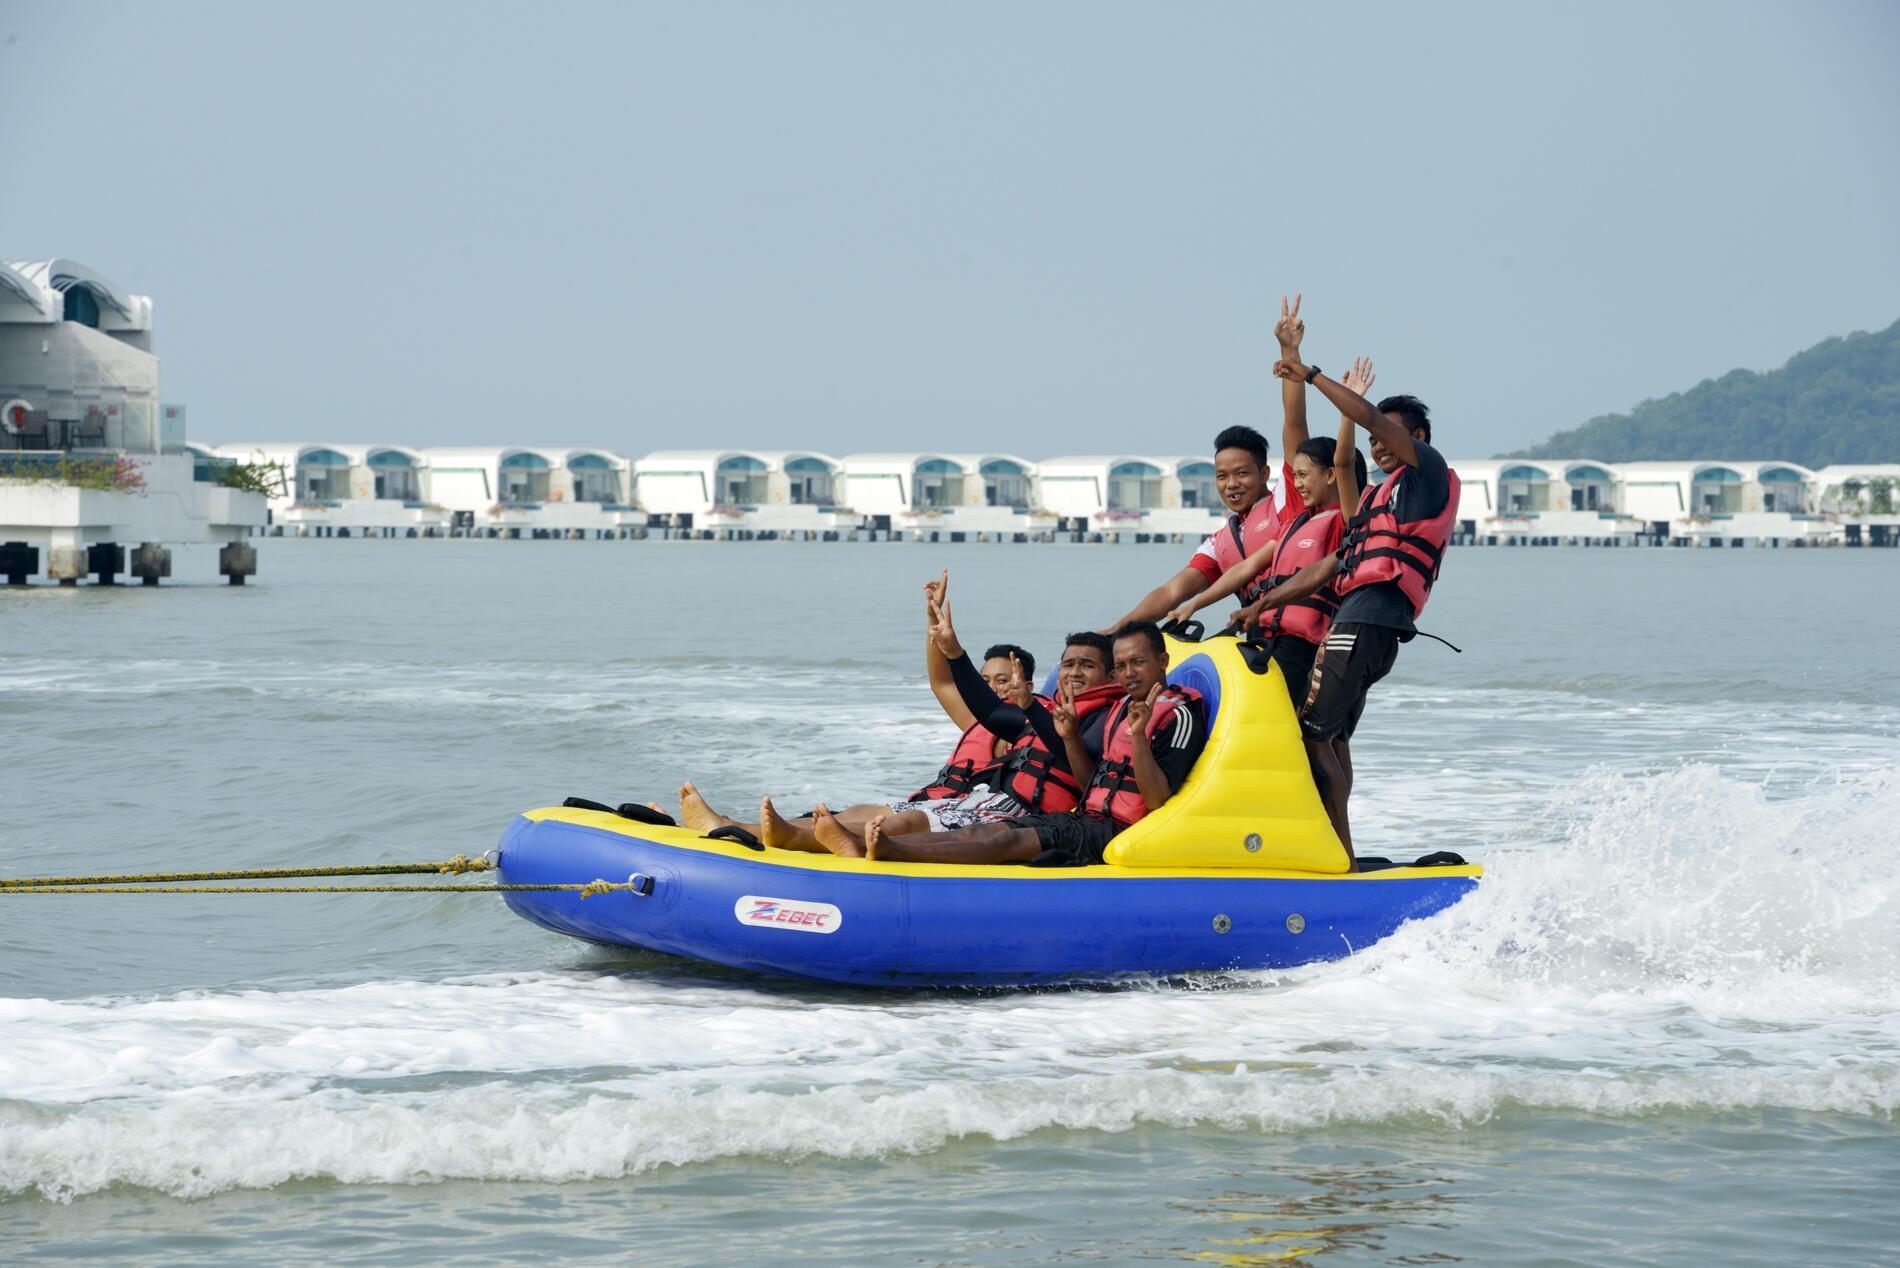 Beach Banana Boat | Outdoor Facilities | Lexis Hibiscus Port Dic